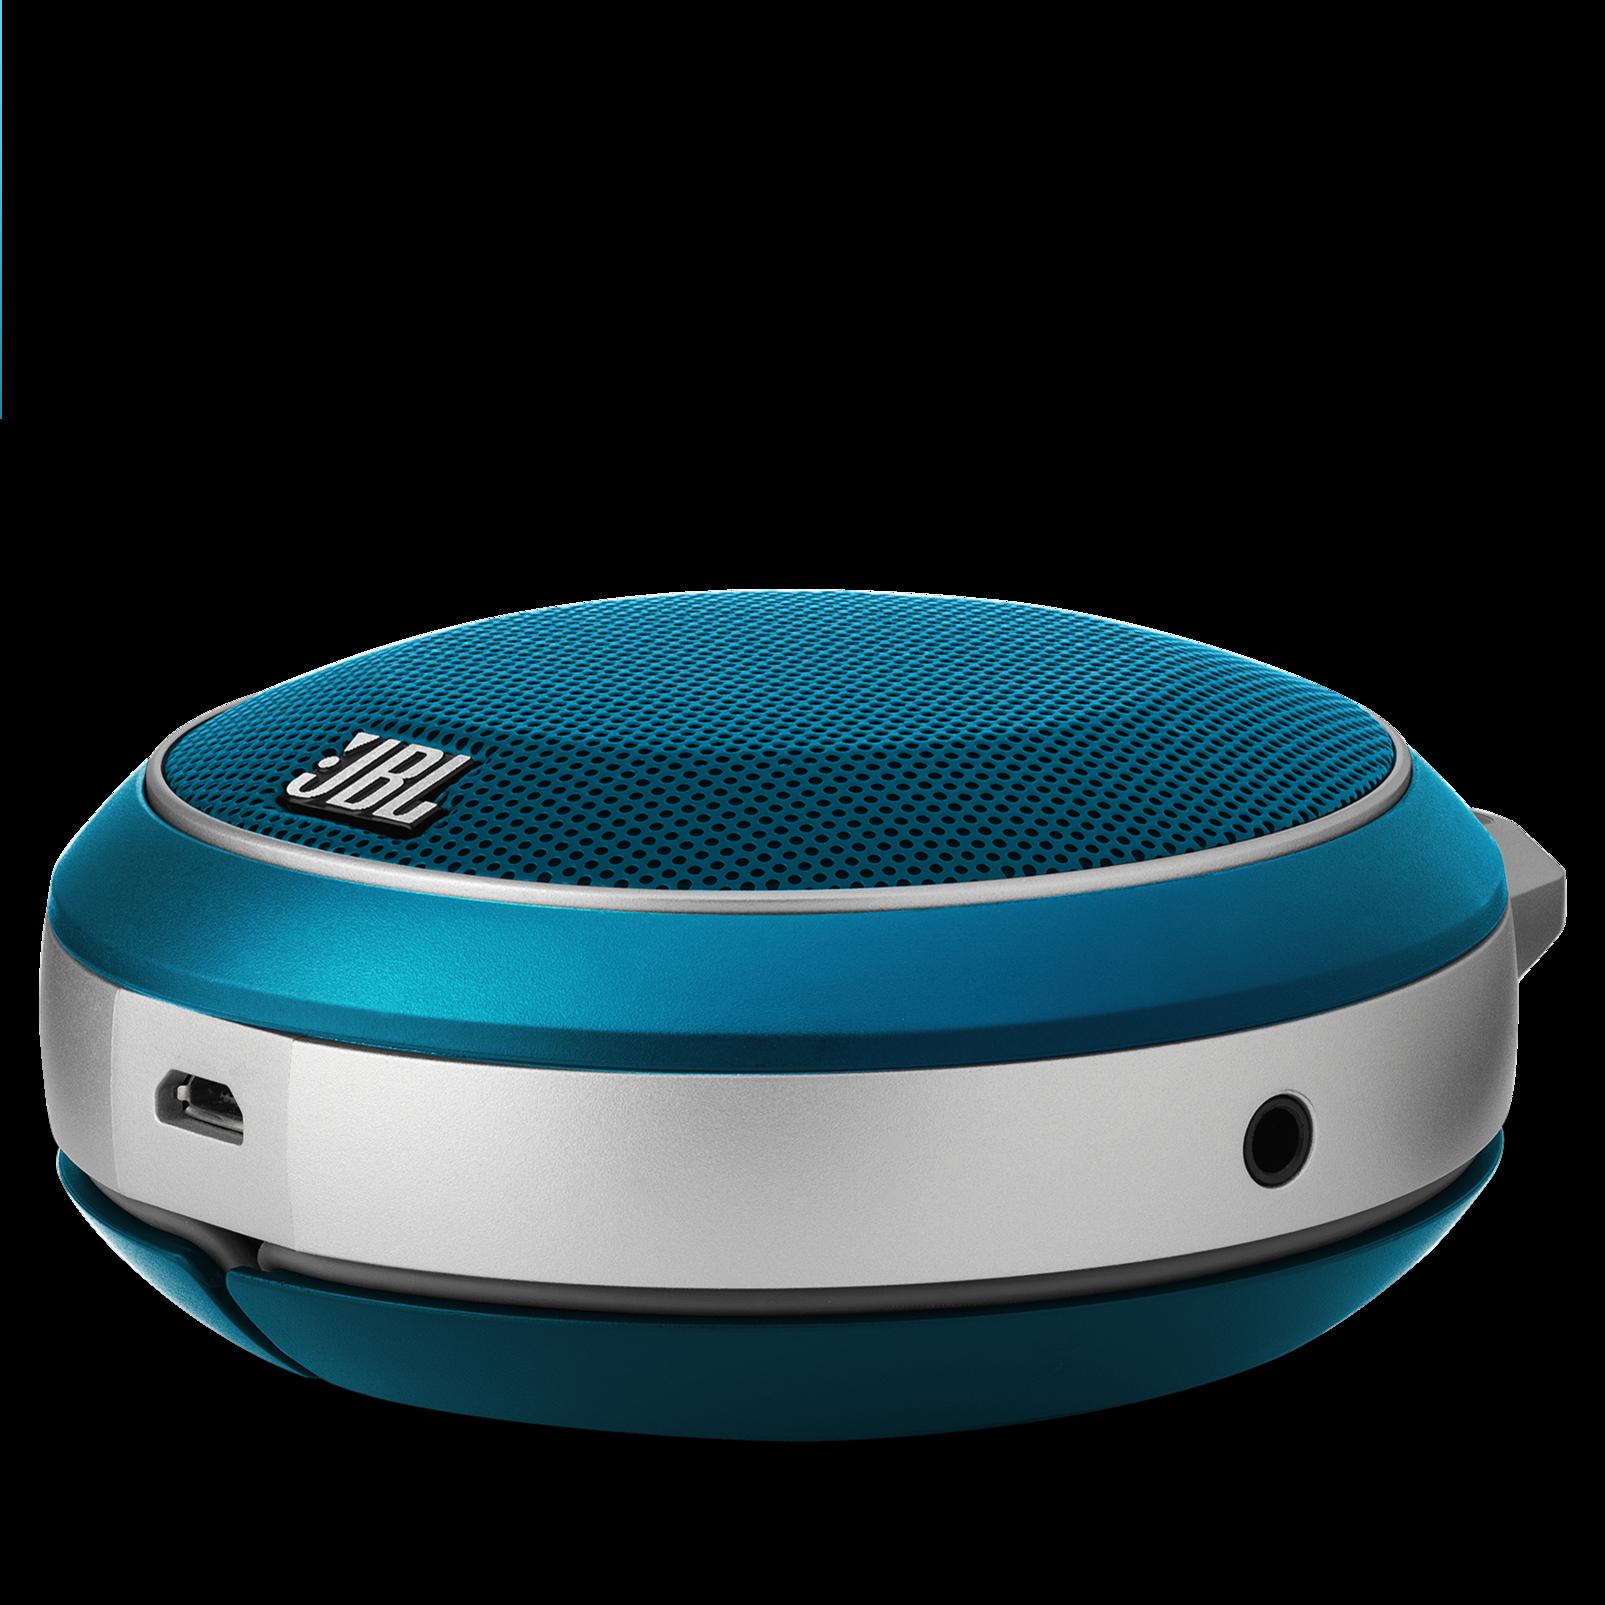 Jbl Micro Wireless Mini Portable Bluetooth Speaker Charge 2 Plus Smartphone Aux